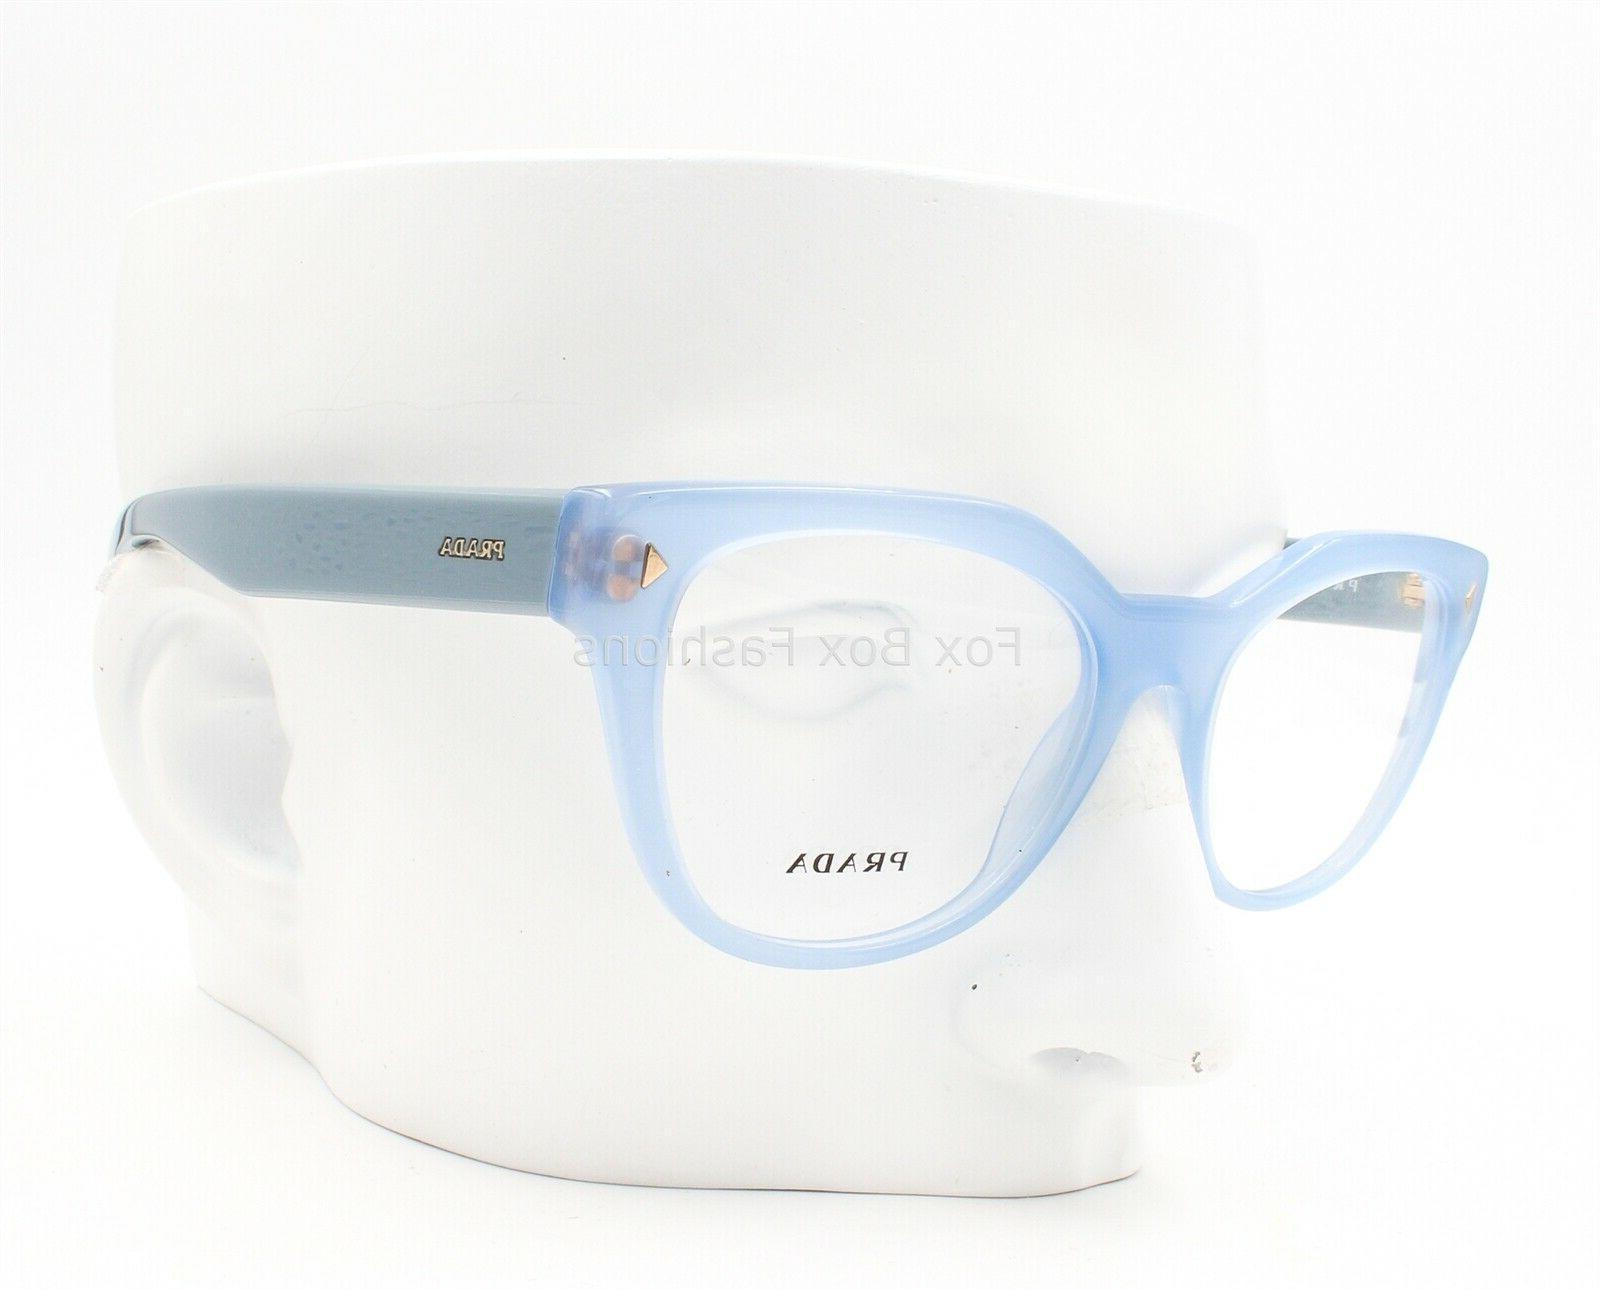 vpr 21s uex 1o1 eyeglasses optical frames